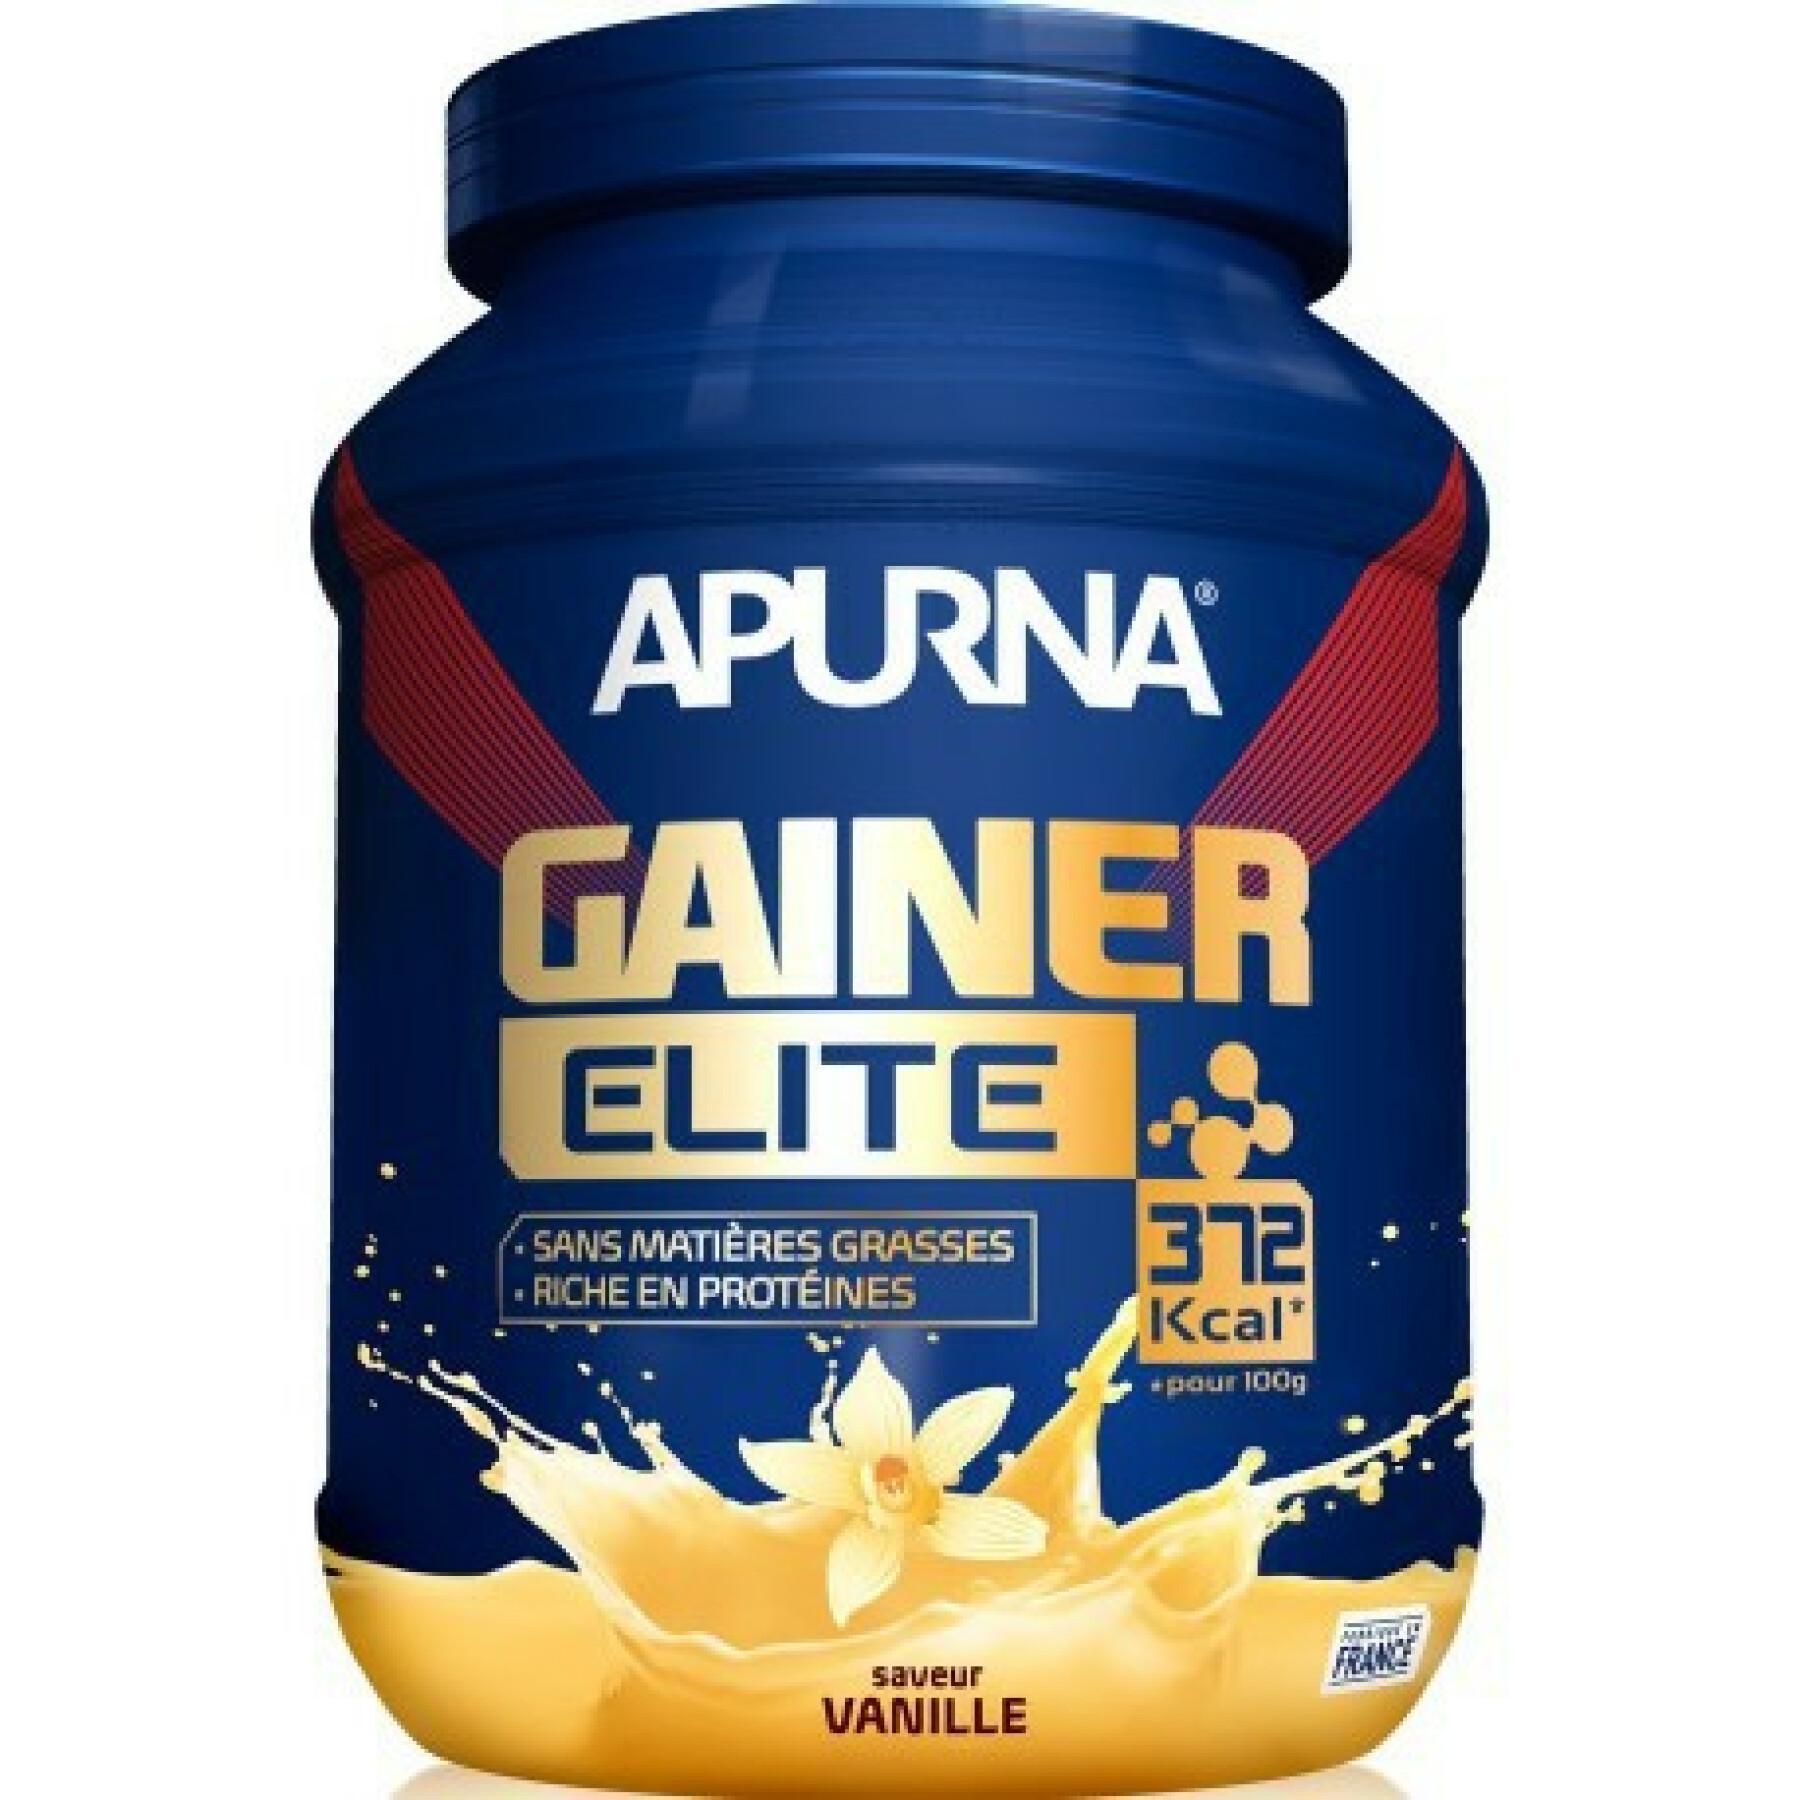 Pot gainer elite Apurna Vanille – 1100g